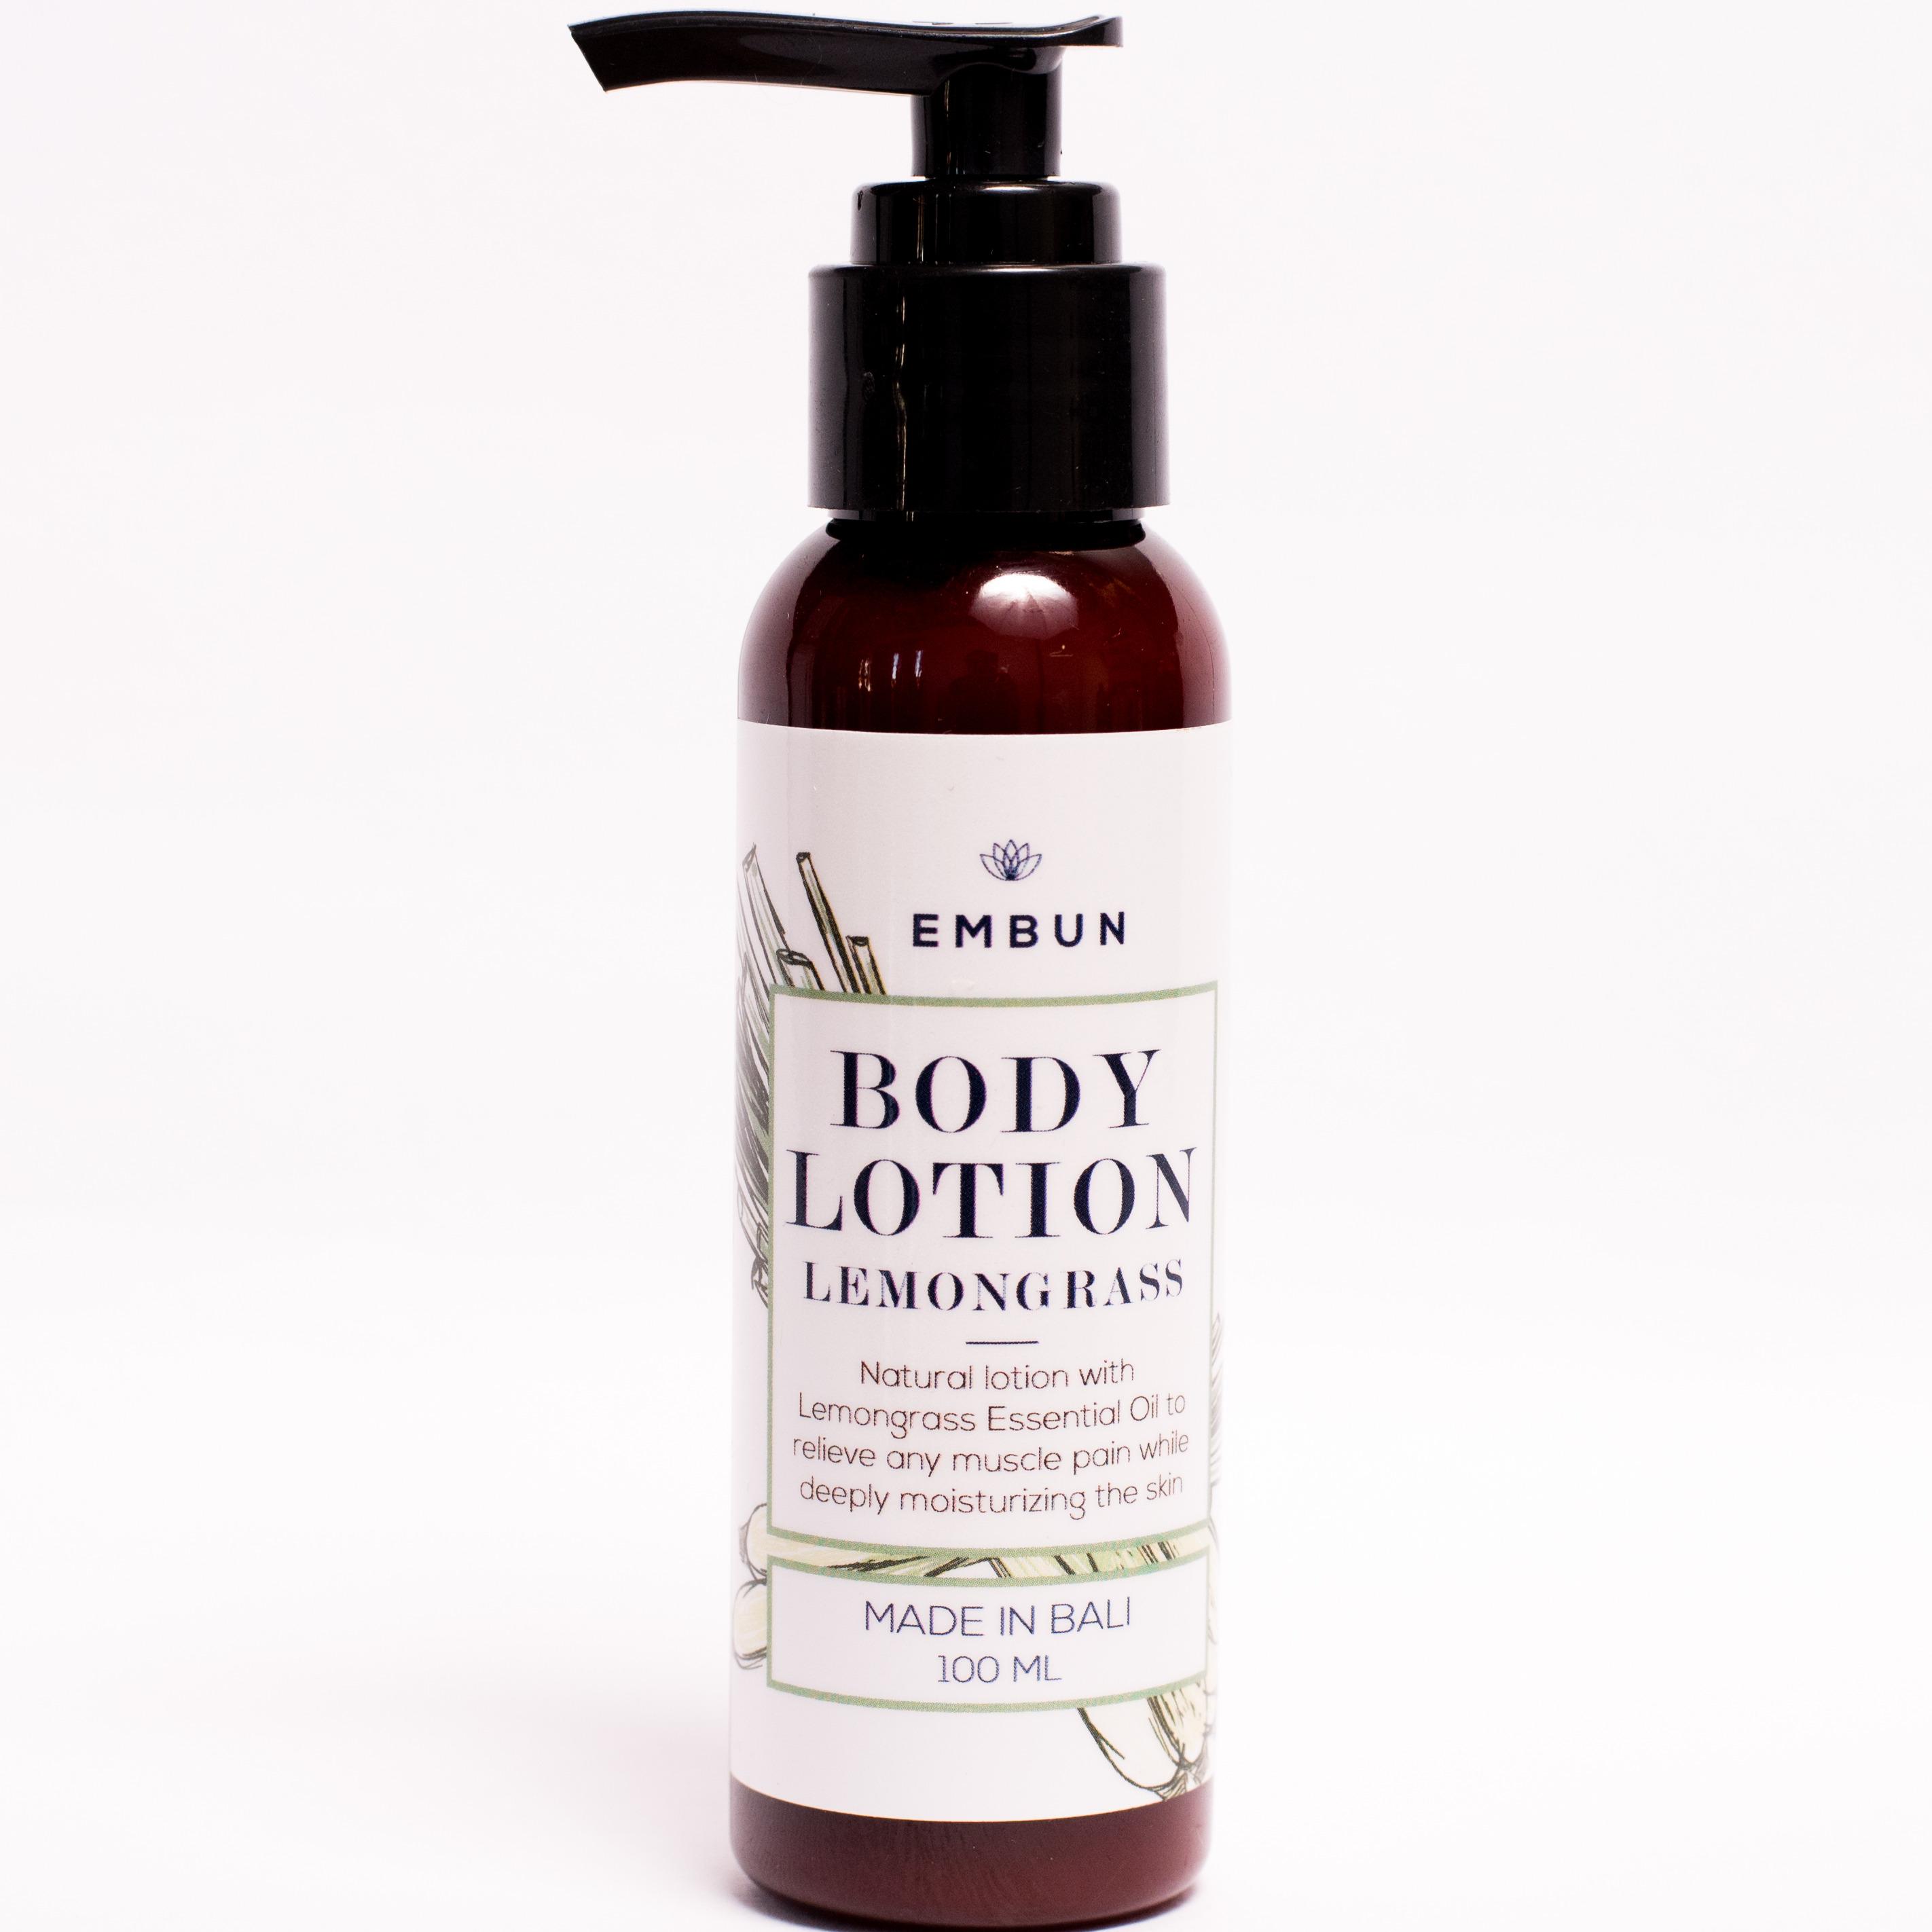 Embun Body Lotion Uplifting Lemongrass